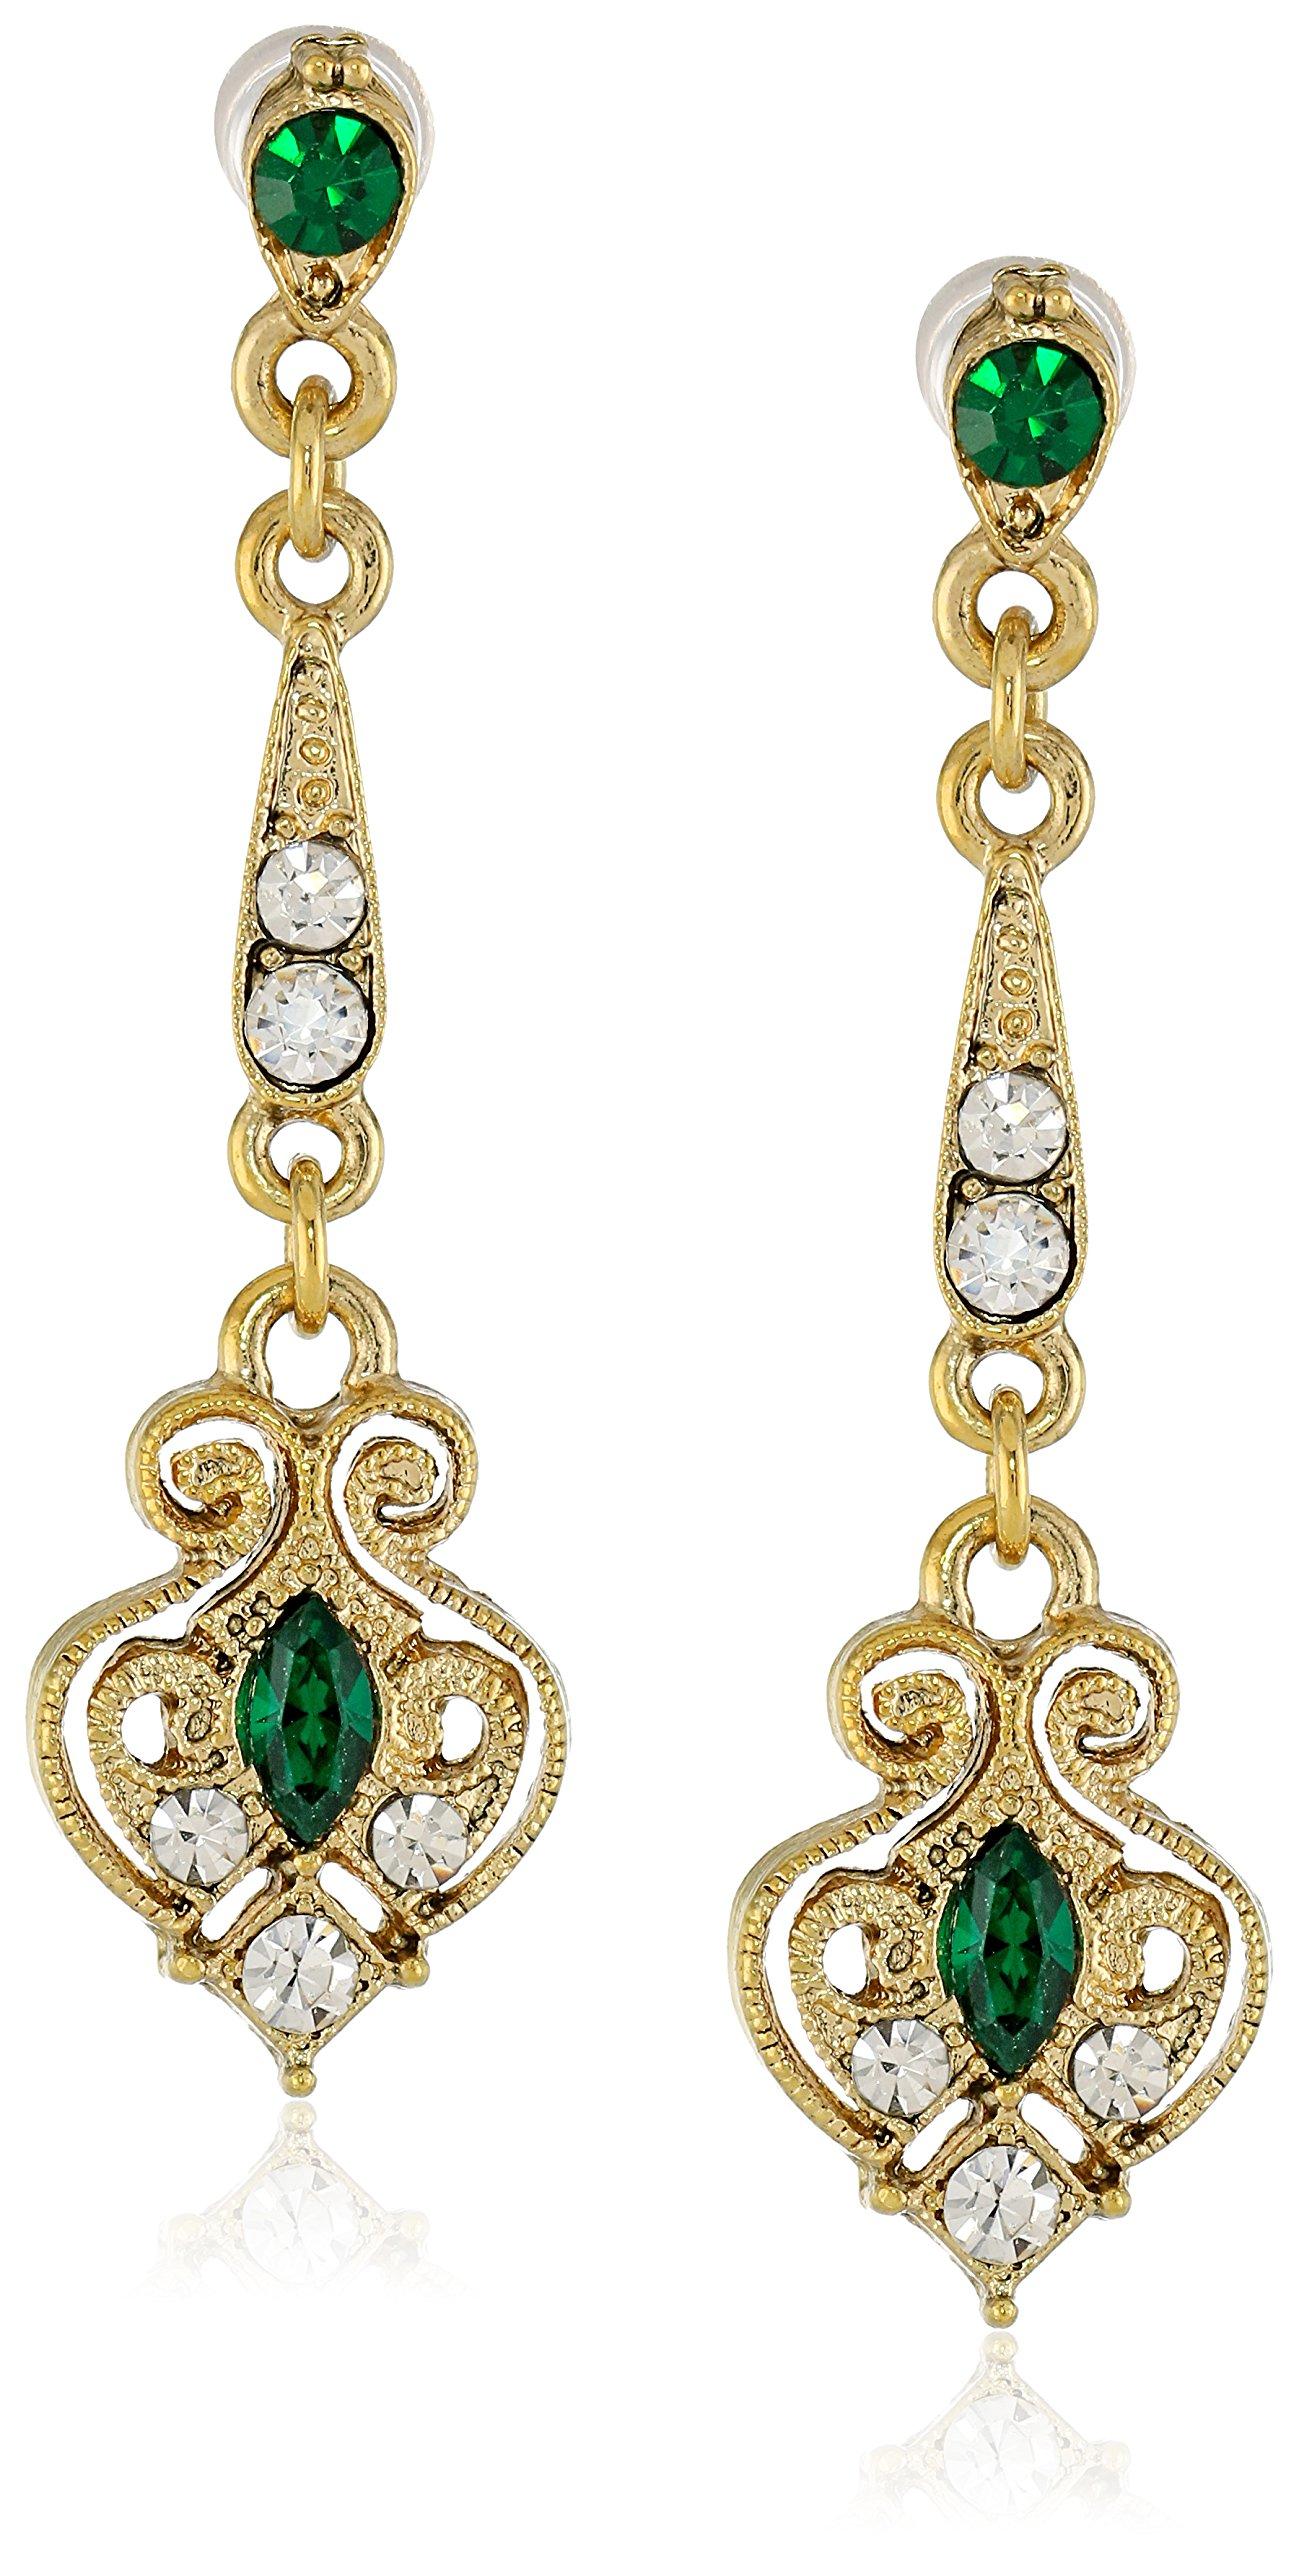 Downton Abbey Gold-Tone Edwardian Filigree Simulated Emerald Drop Earrings